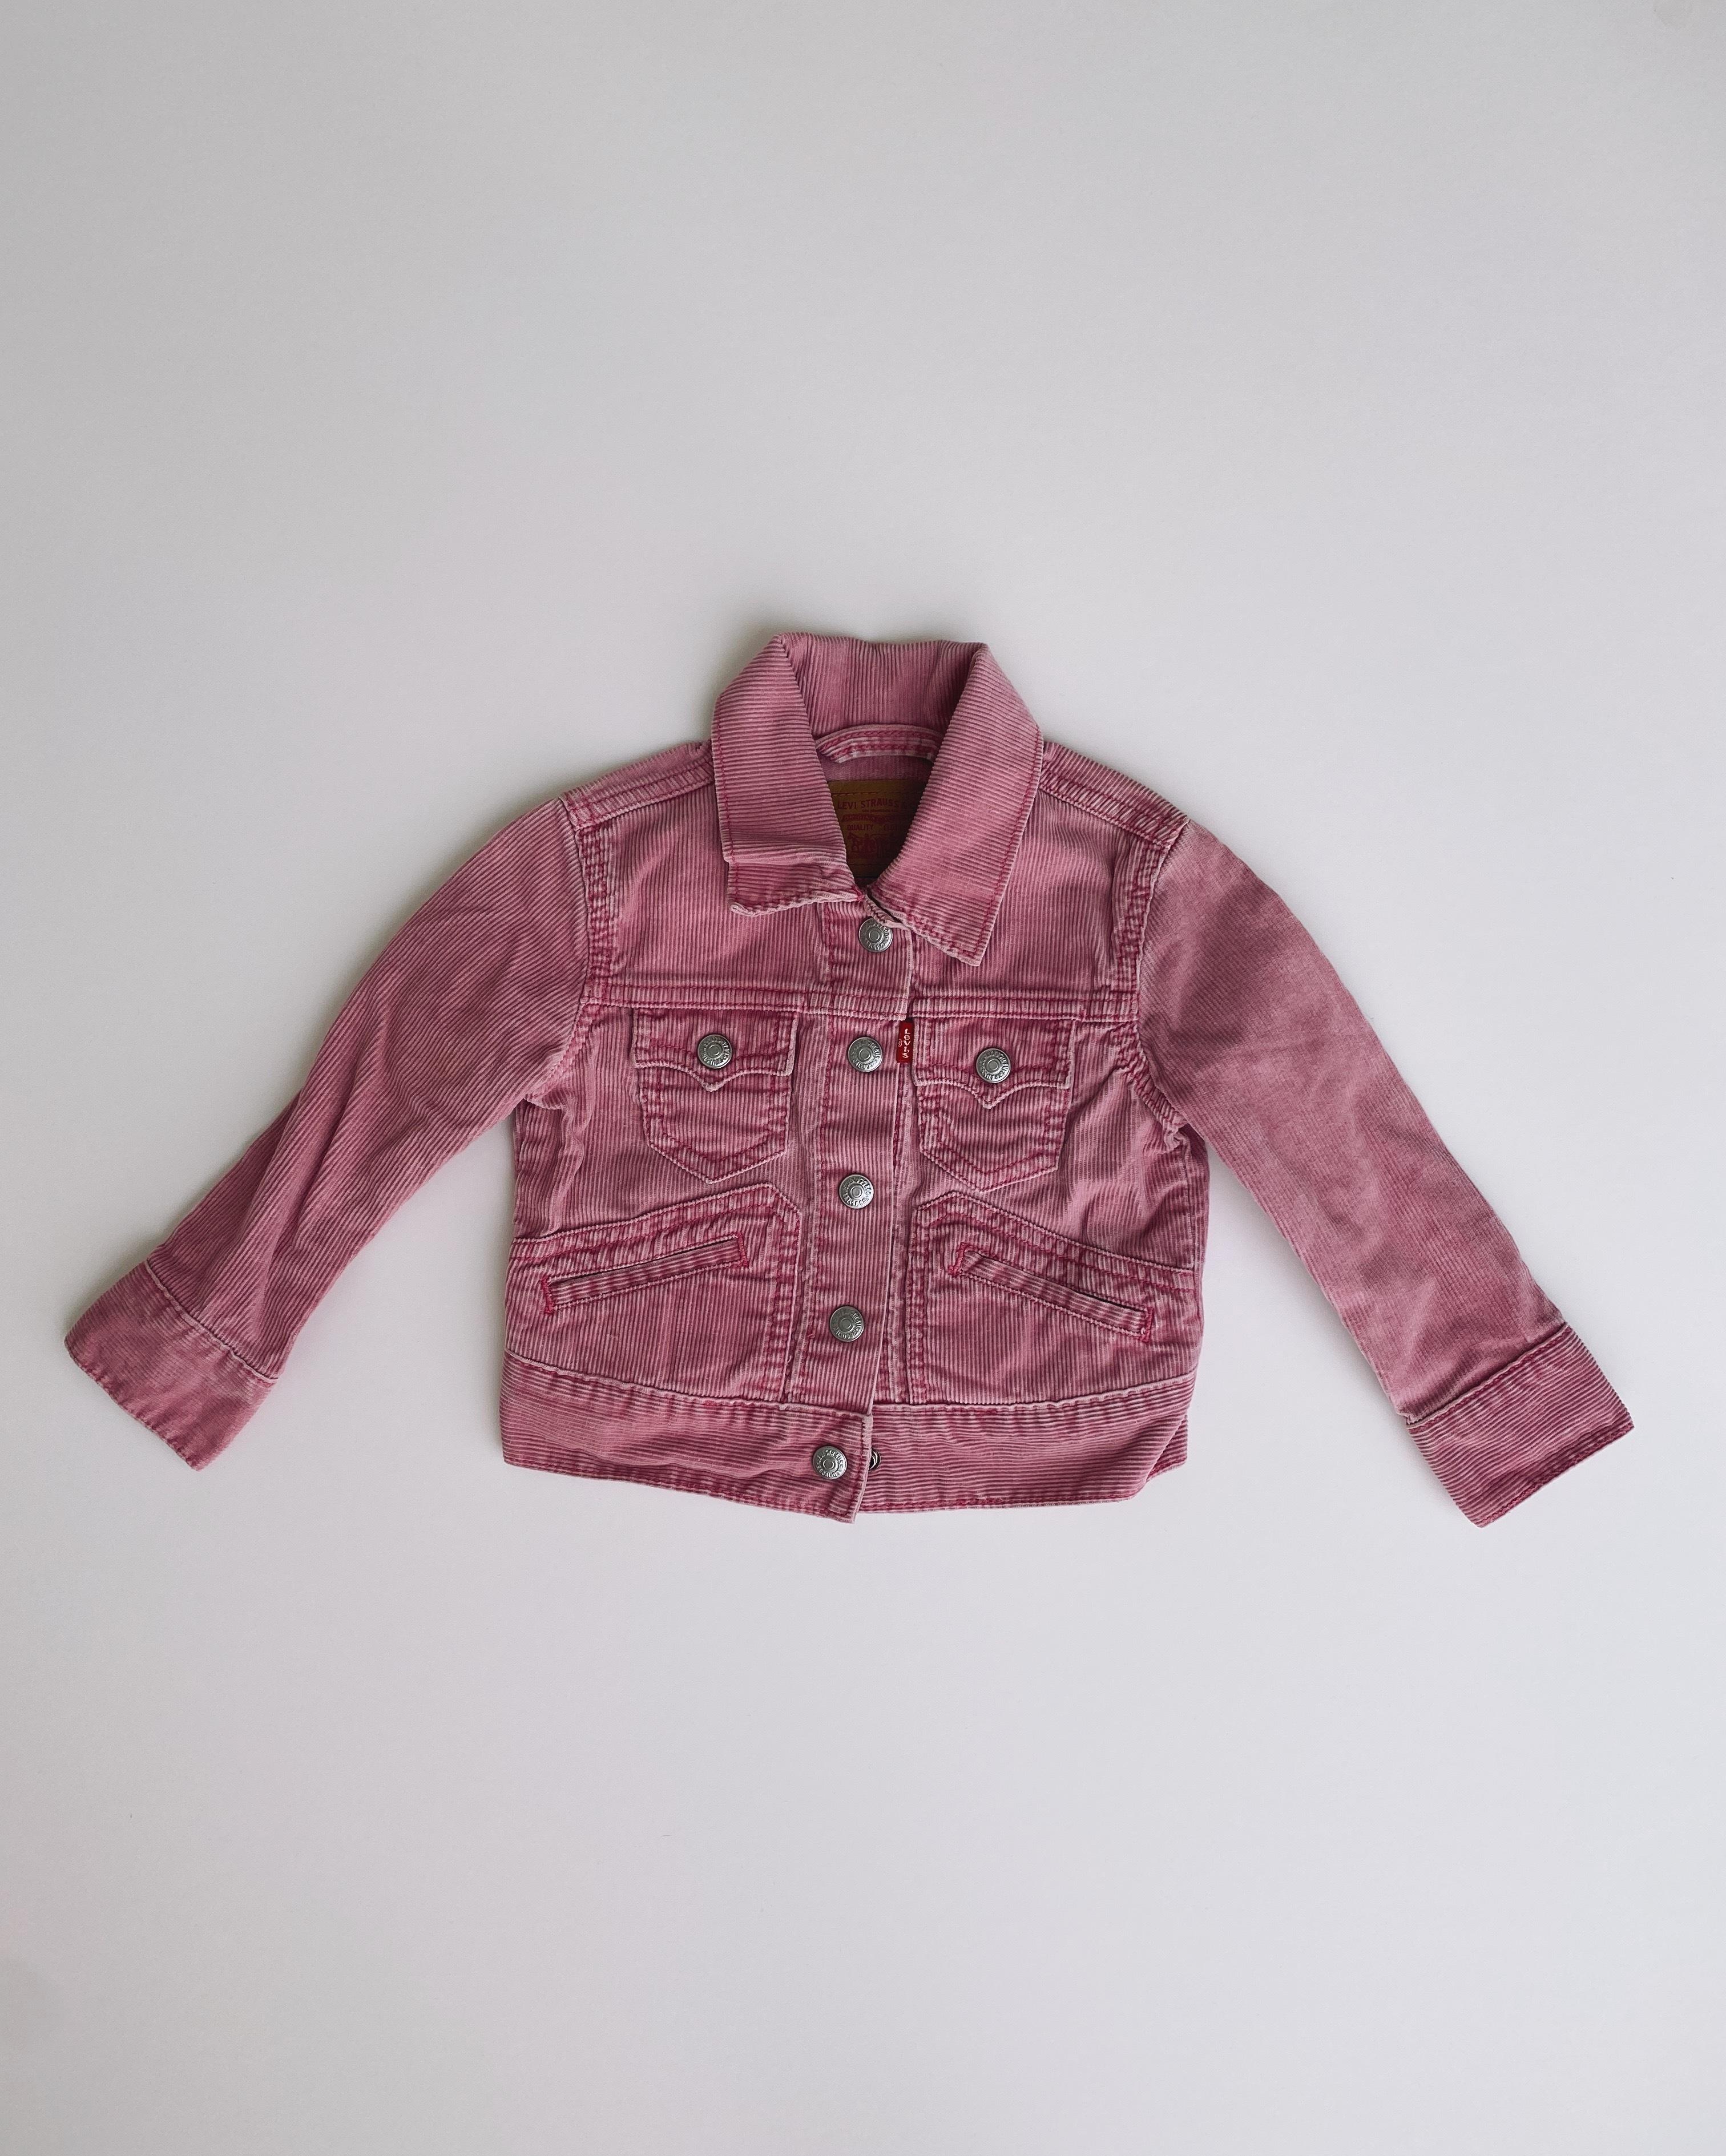 (KD202)95cm Levi's corduroy jacket